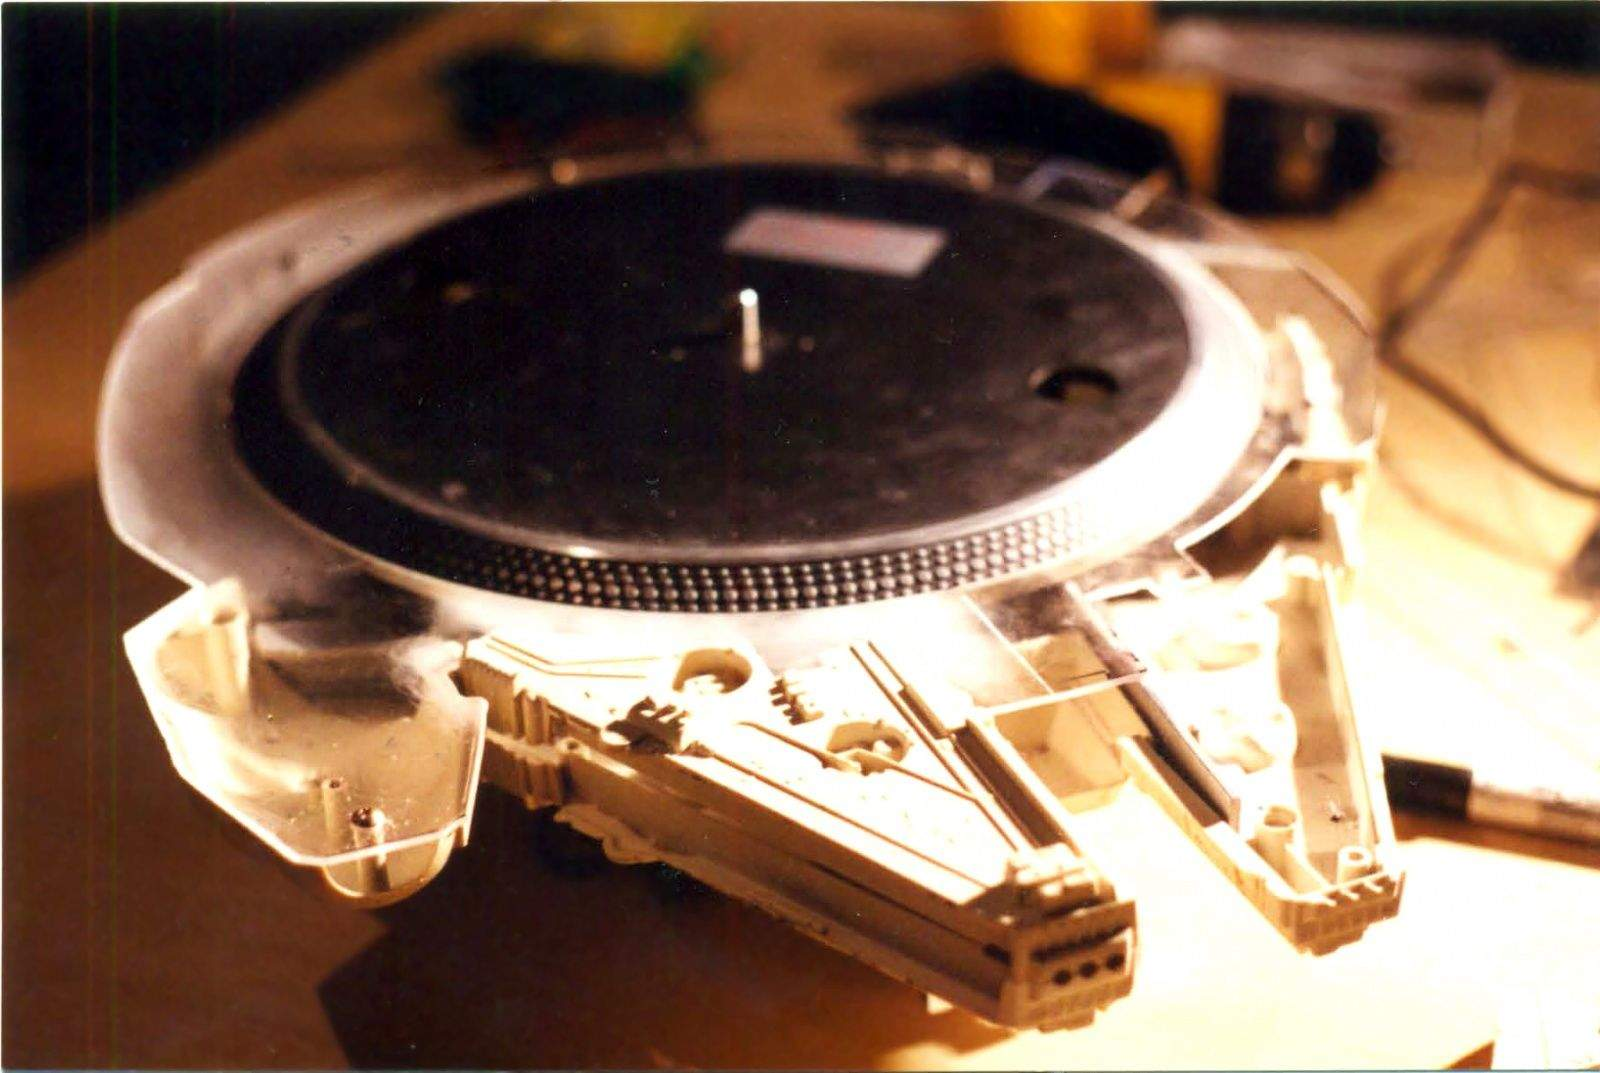 The Millennium Falcon makes a great DJ turntable. Photo: Marco at Picotek